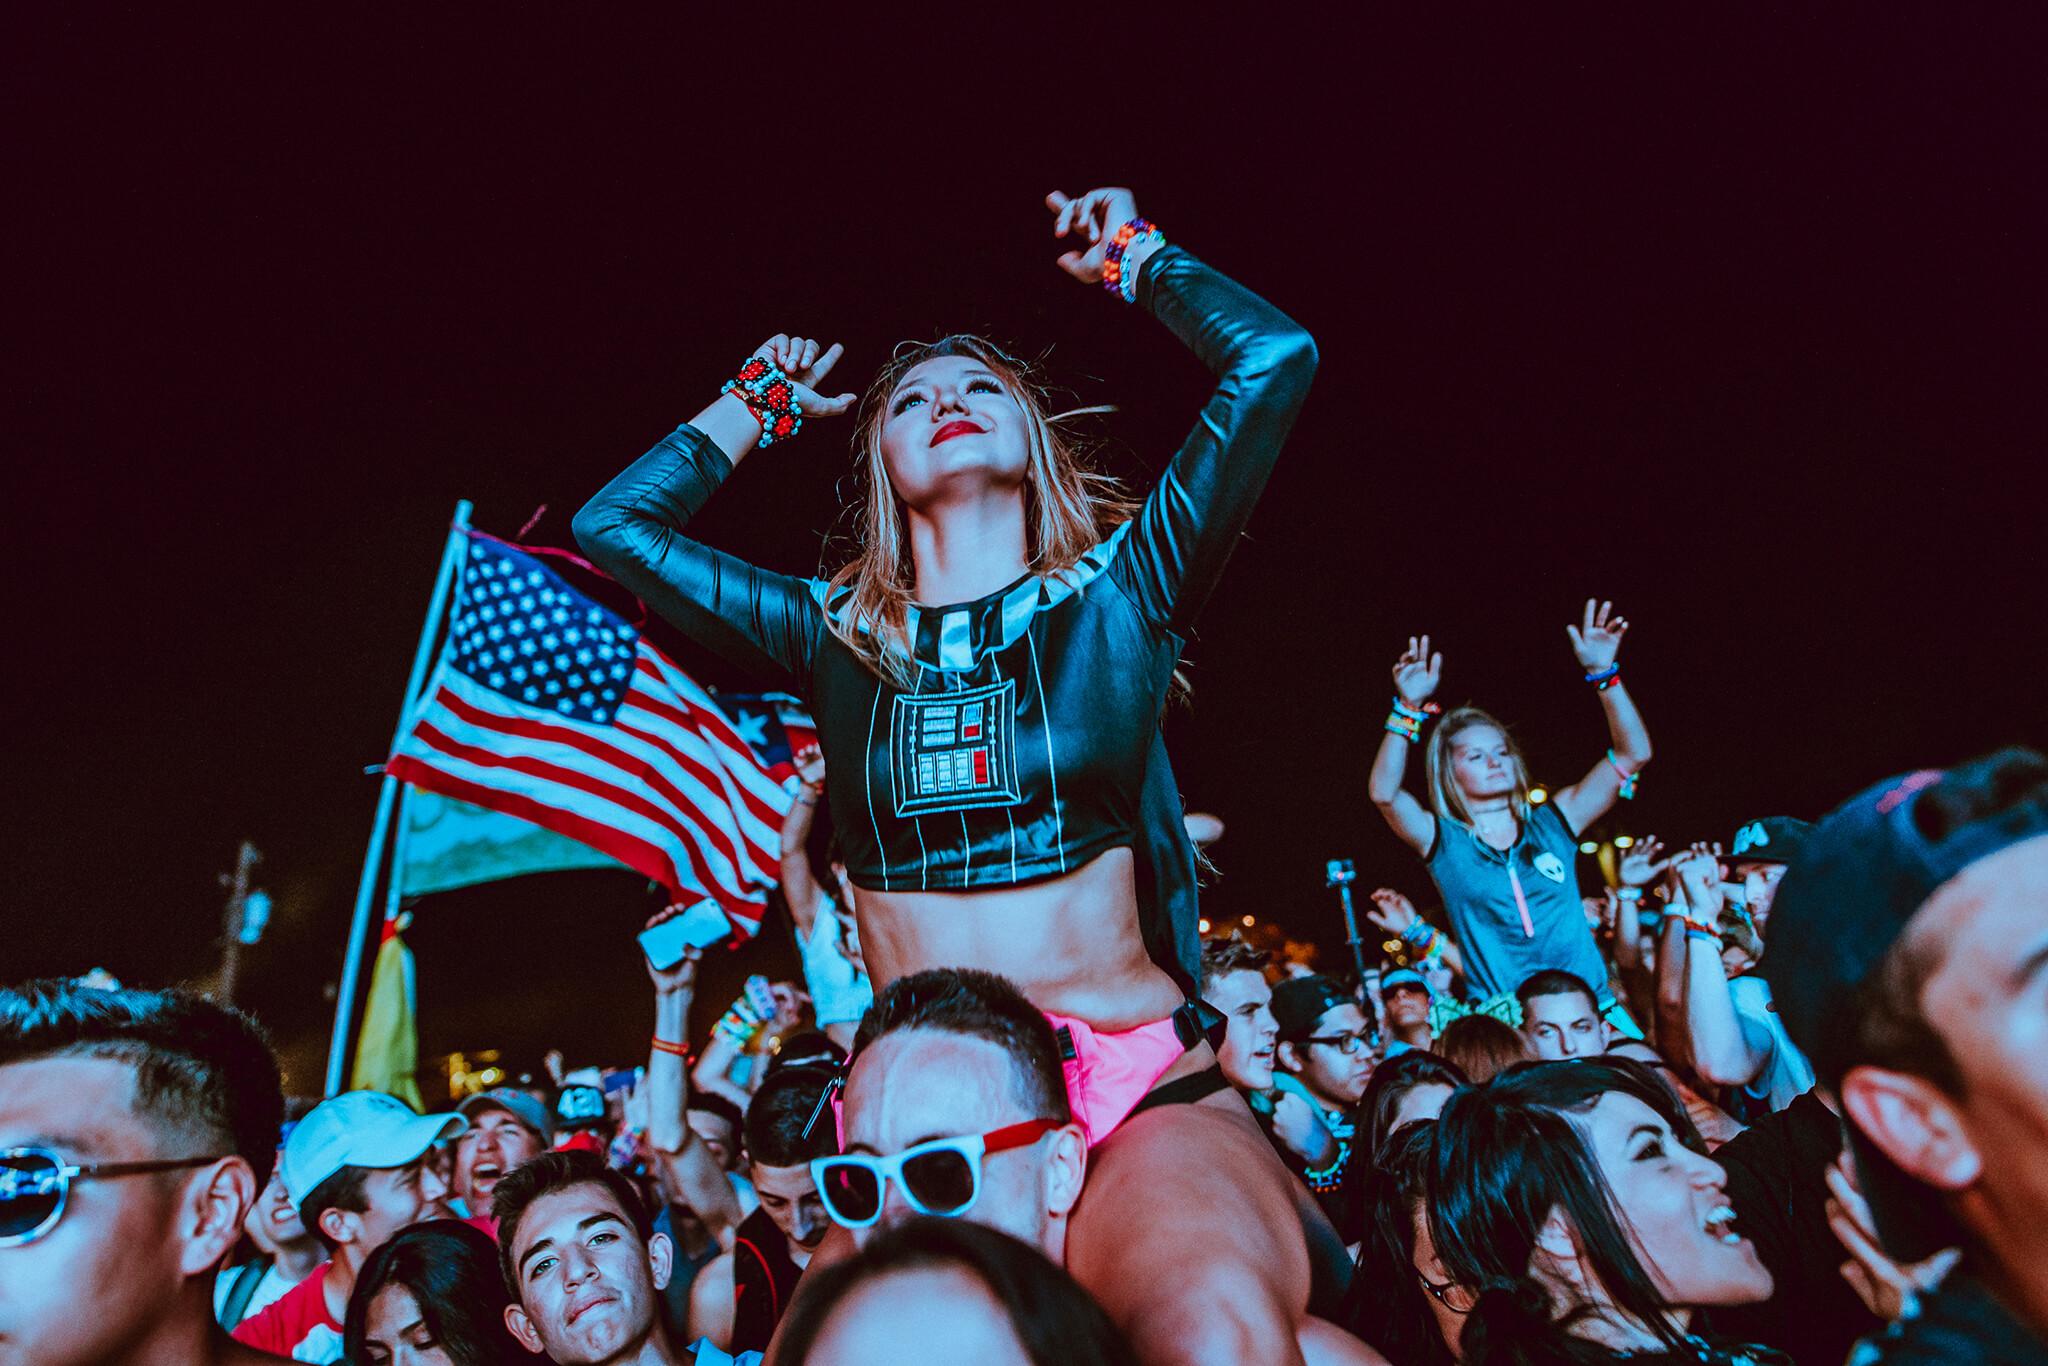 girl on guys shoulders in crowd